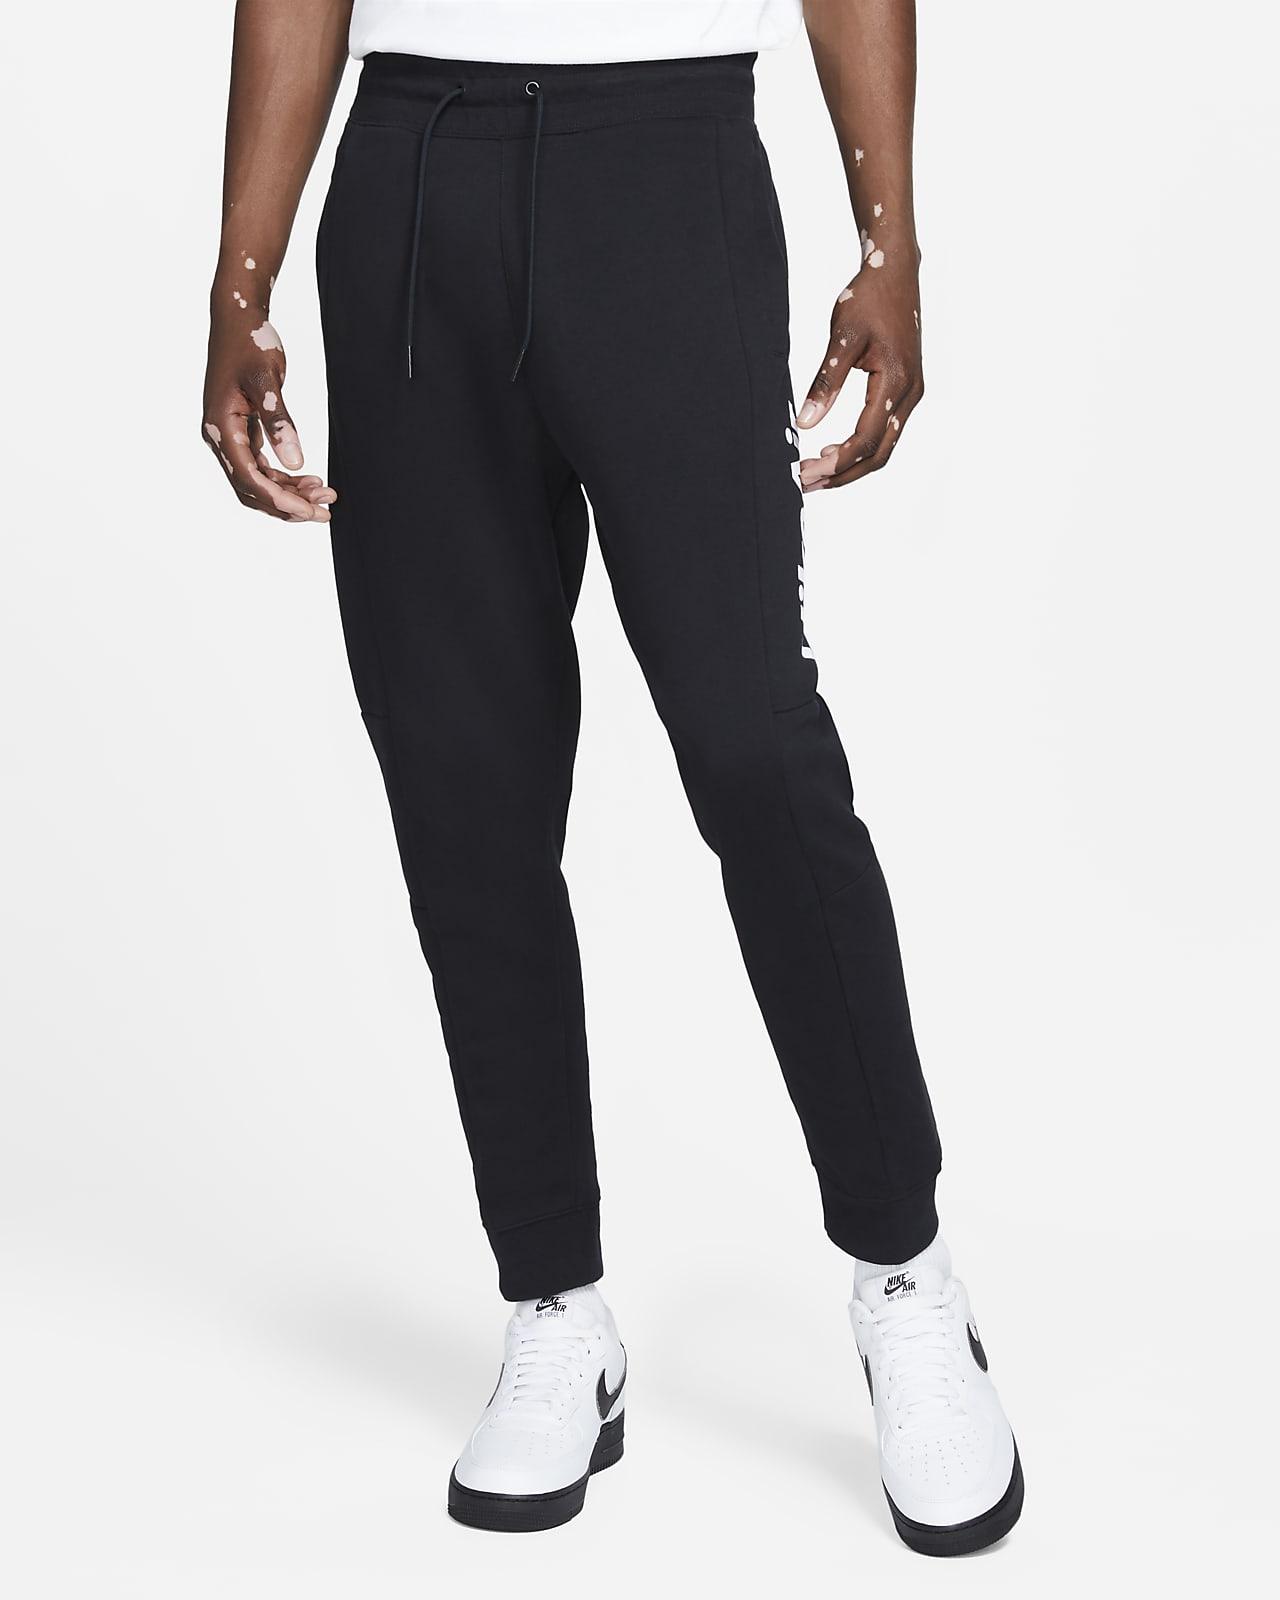 Nike Air Men's Fleece Pants